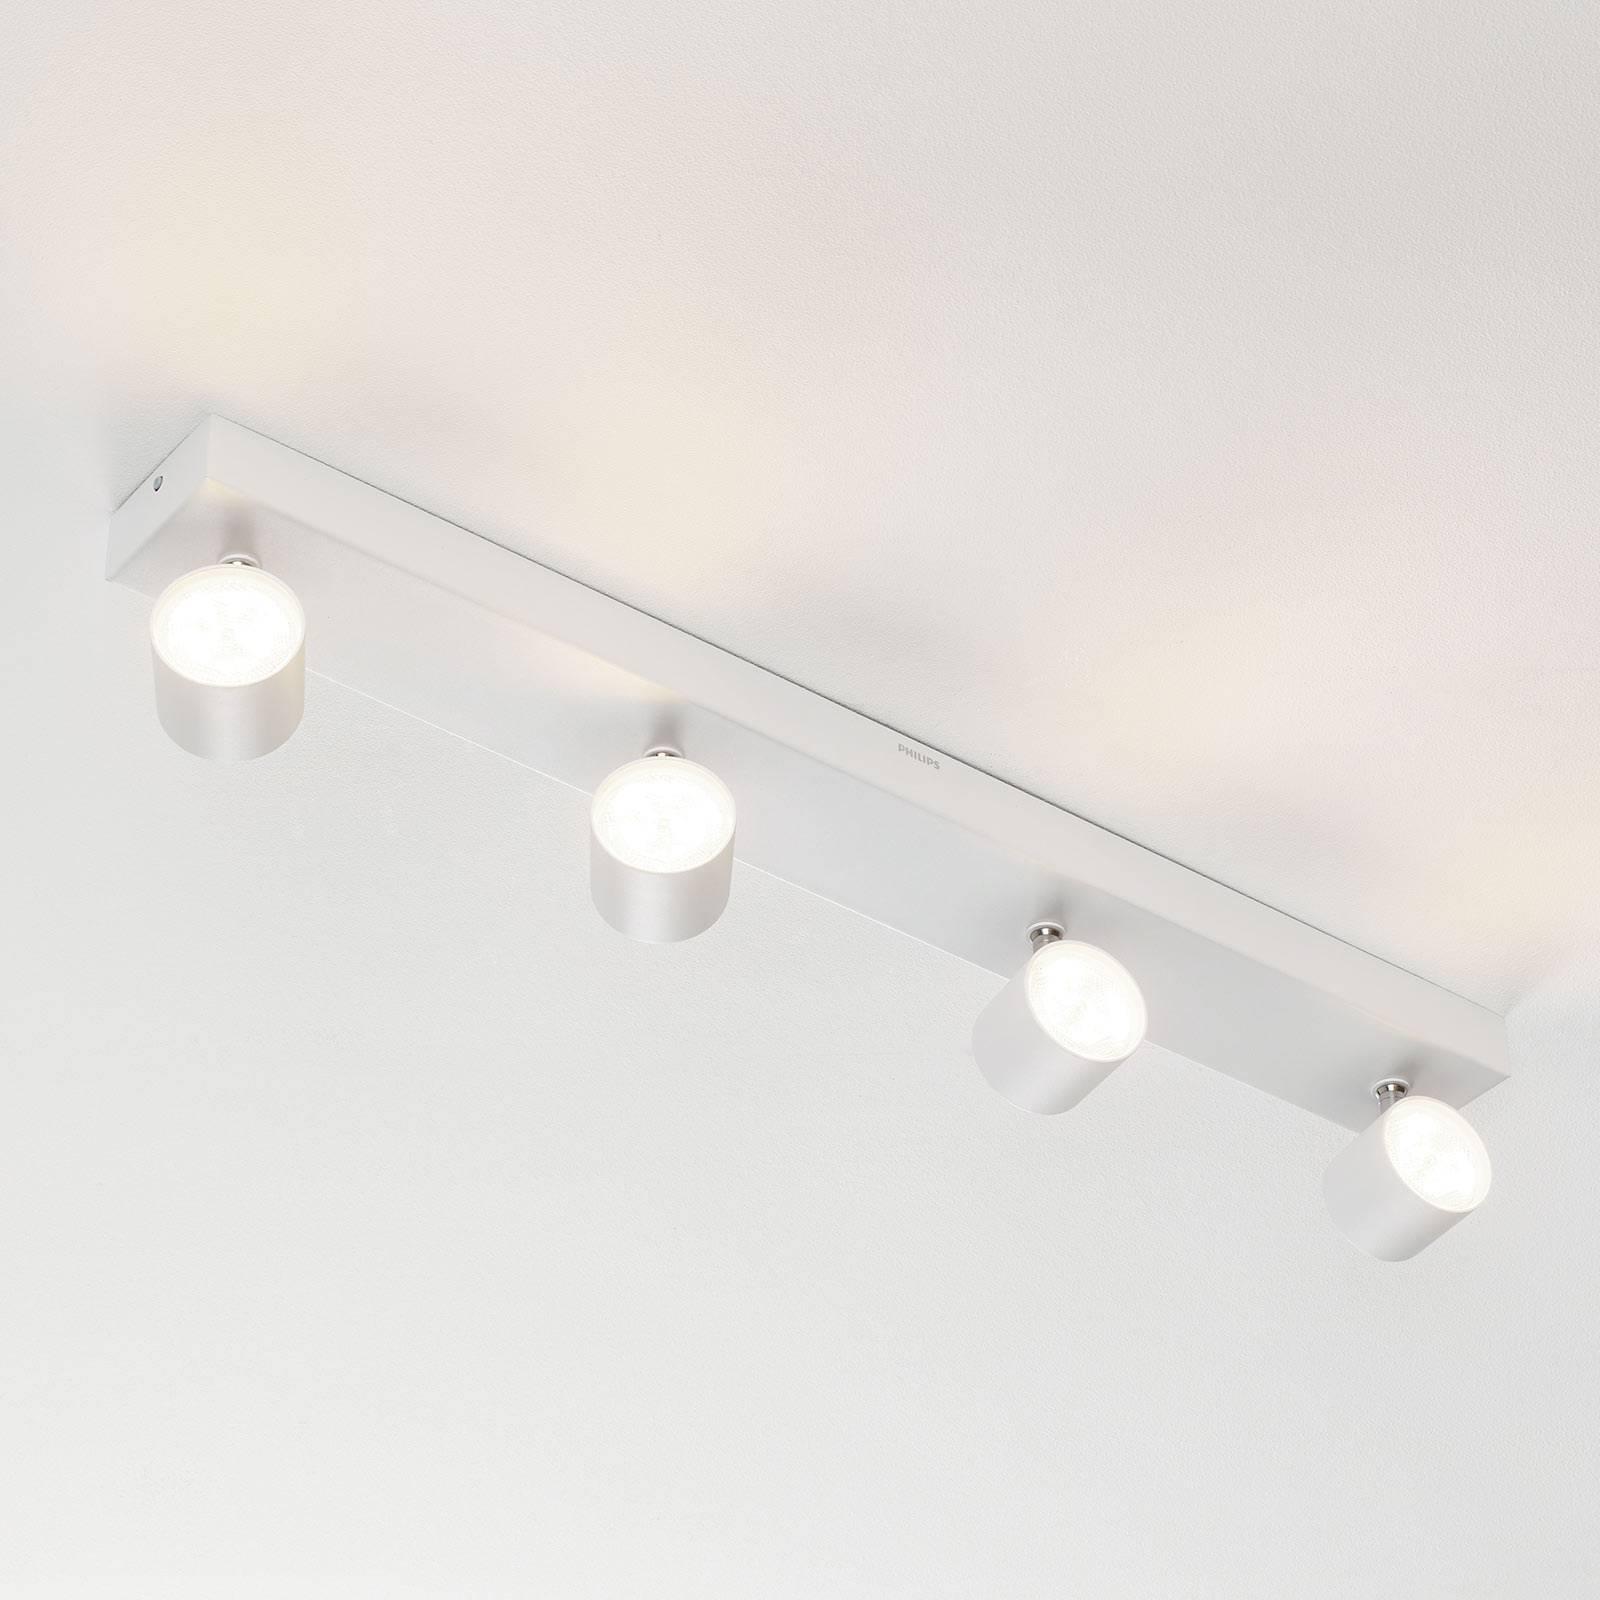 Quadruplo spot LED Star, warmglow, bianco